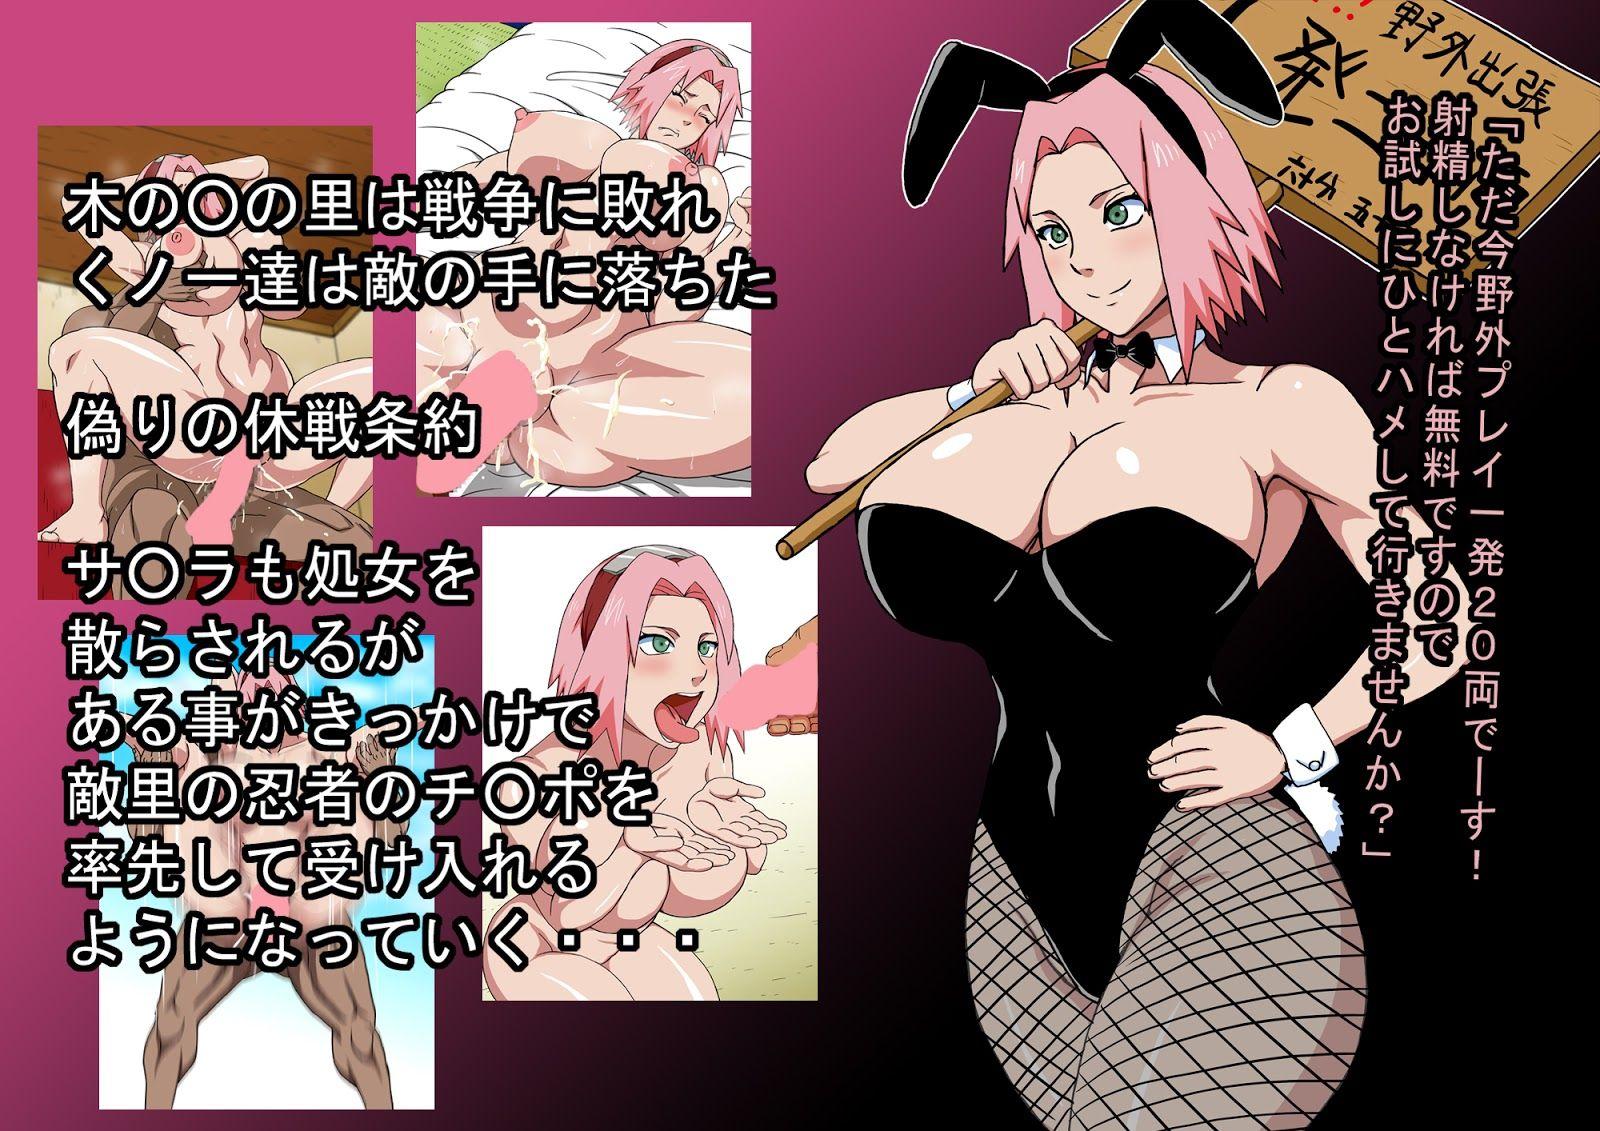 very hot sexe girl